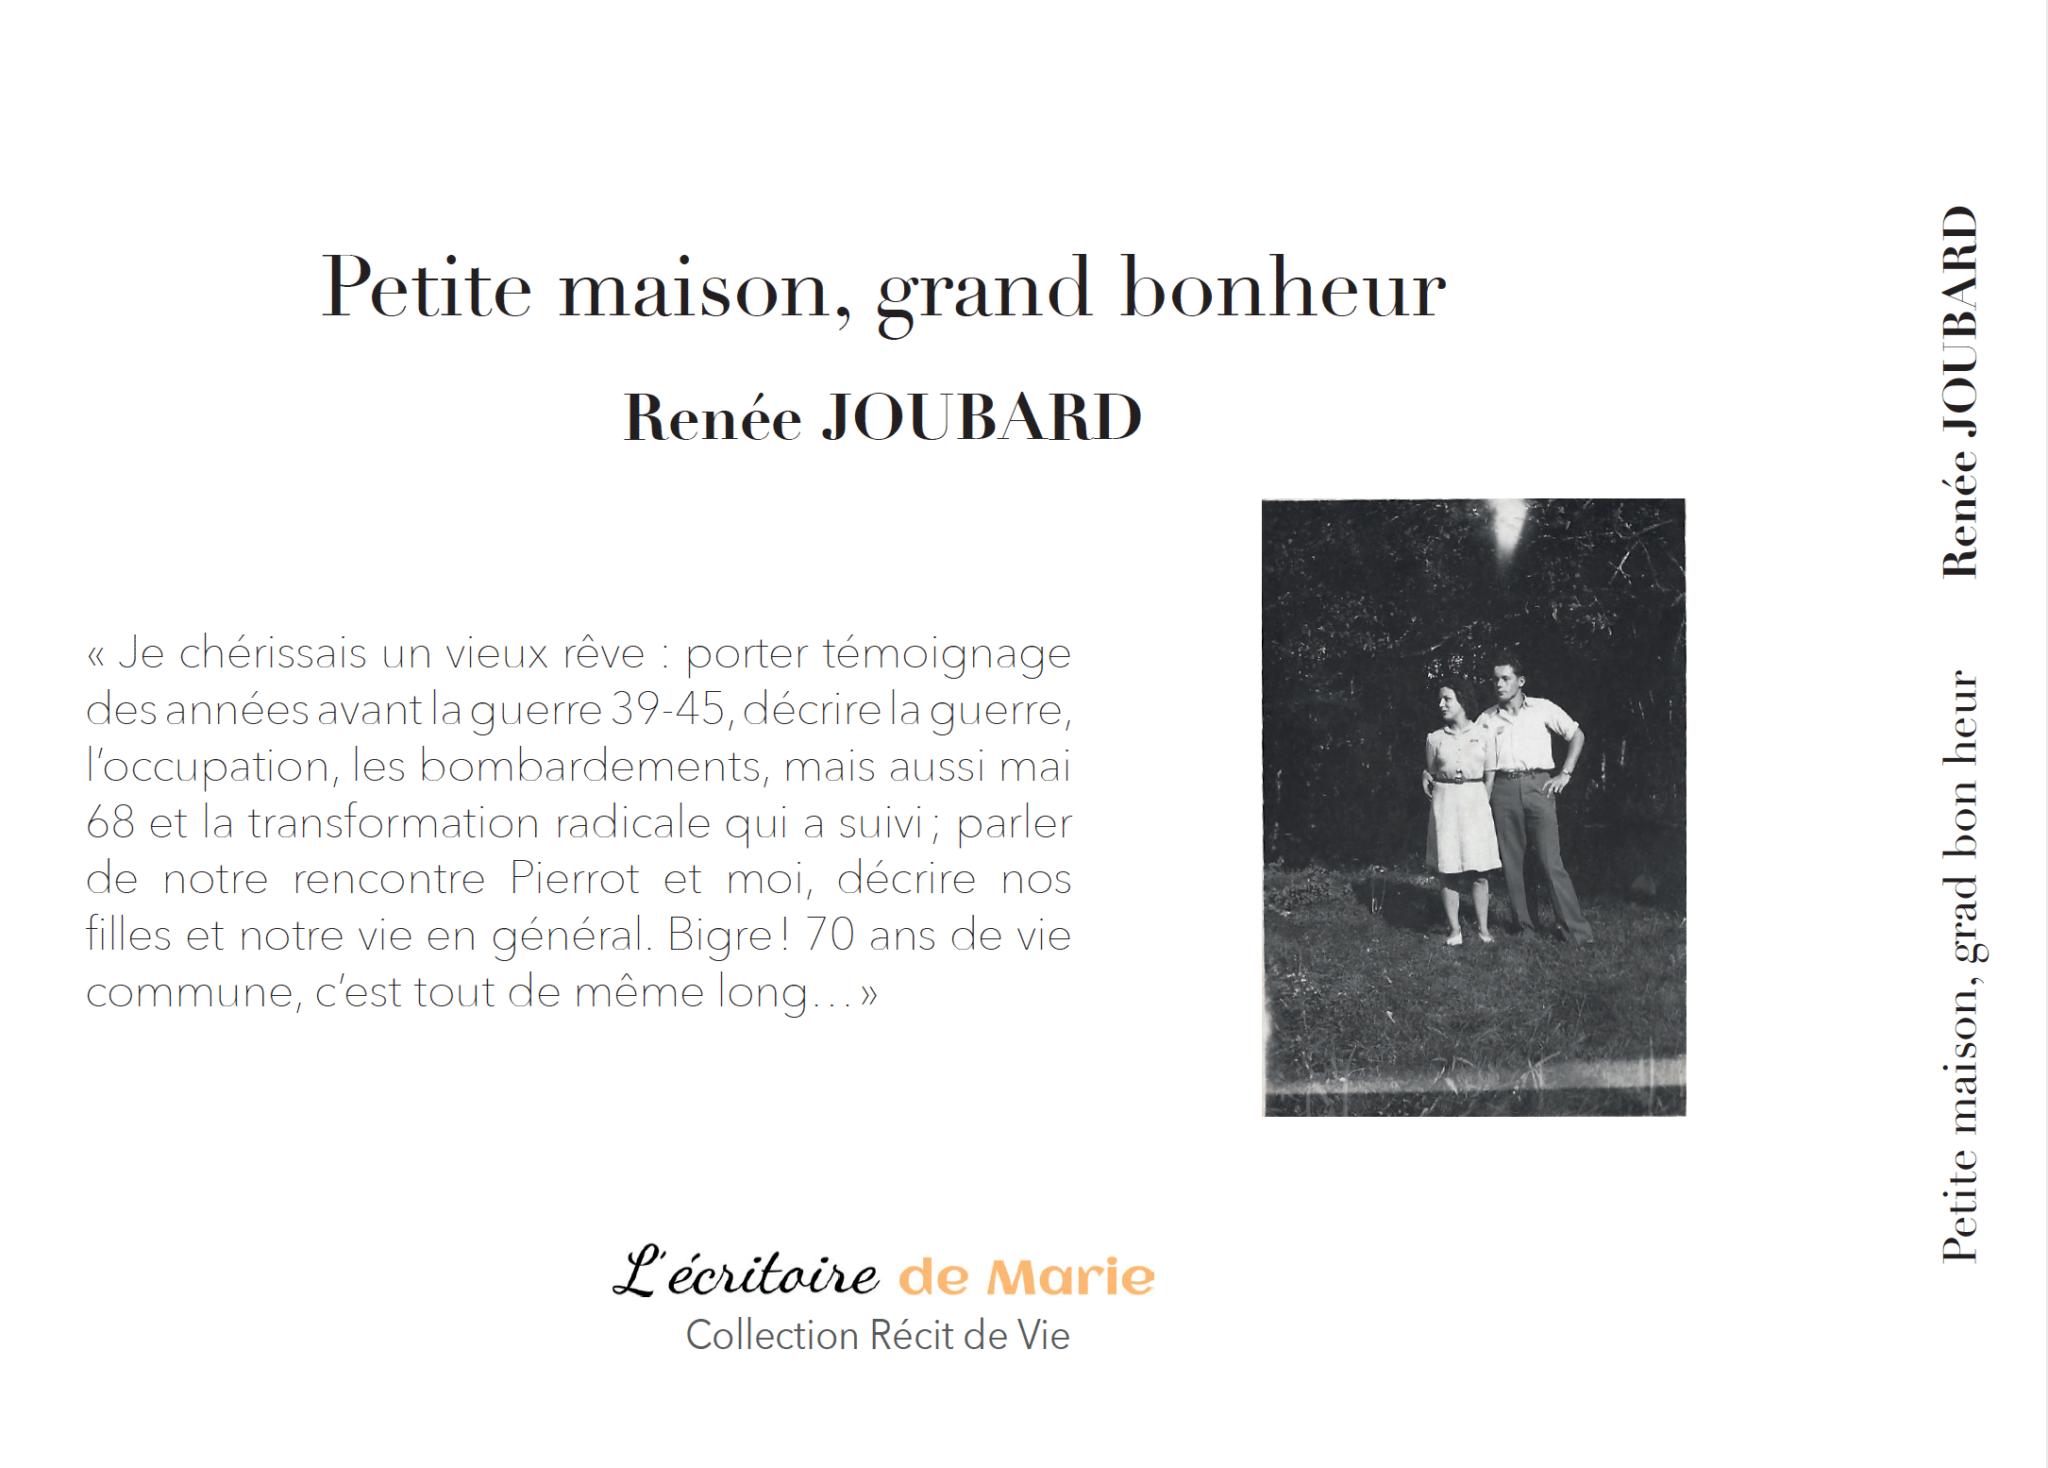 recit-de-vie-lecritoiredemarie-2020-Petite-maison-grand-bonheur-renee-joubard-2